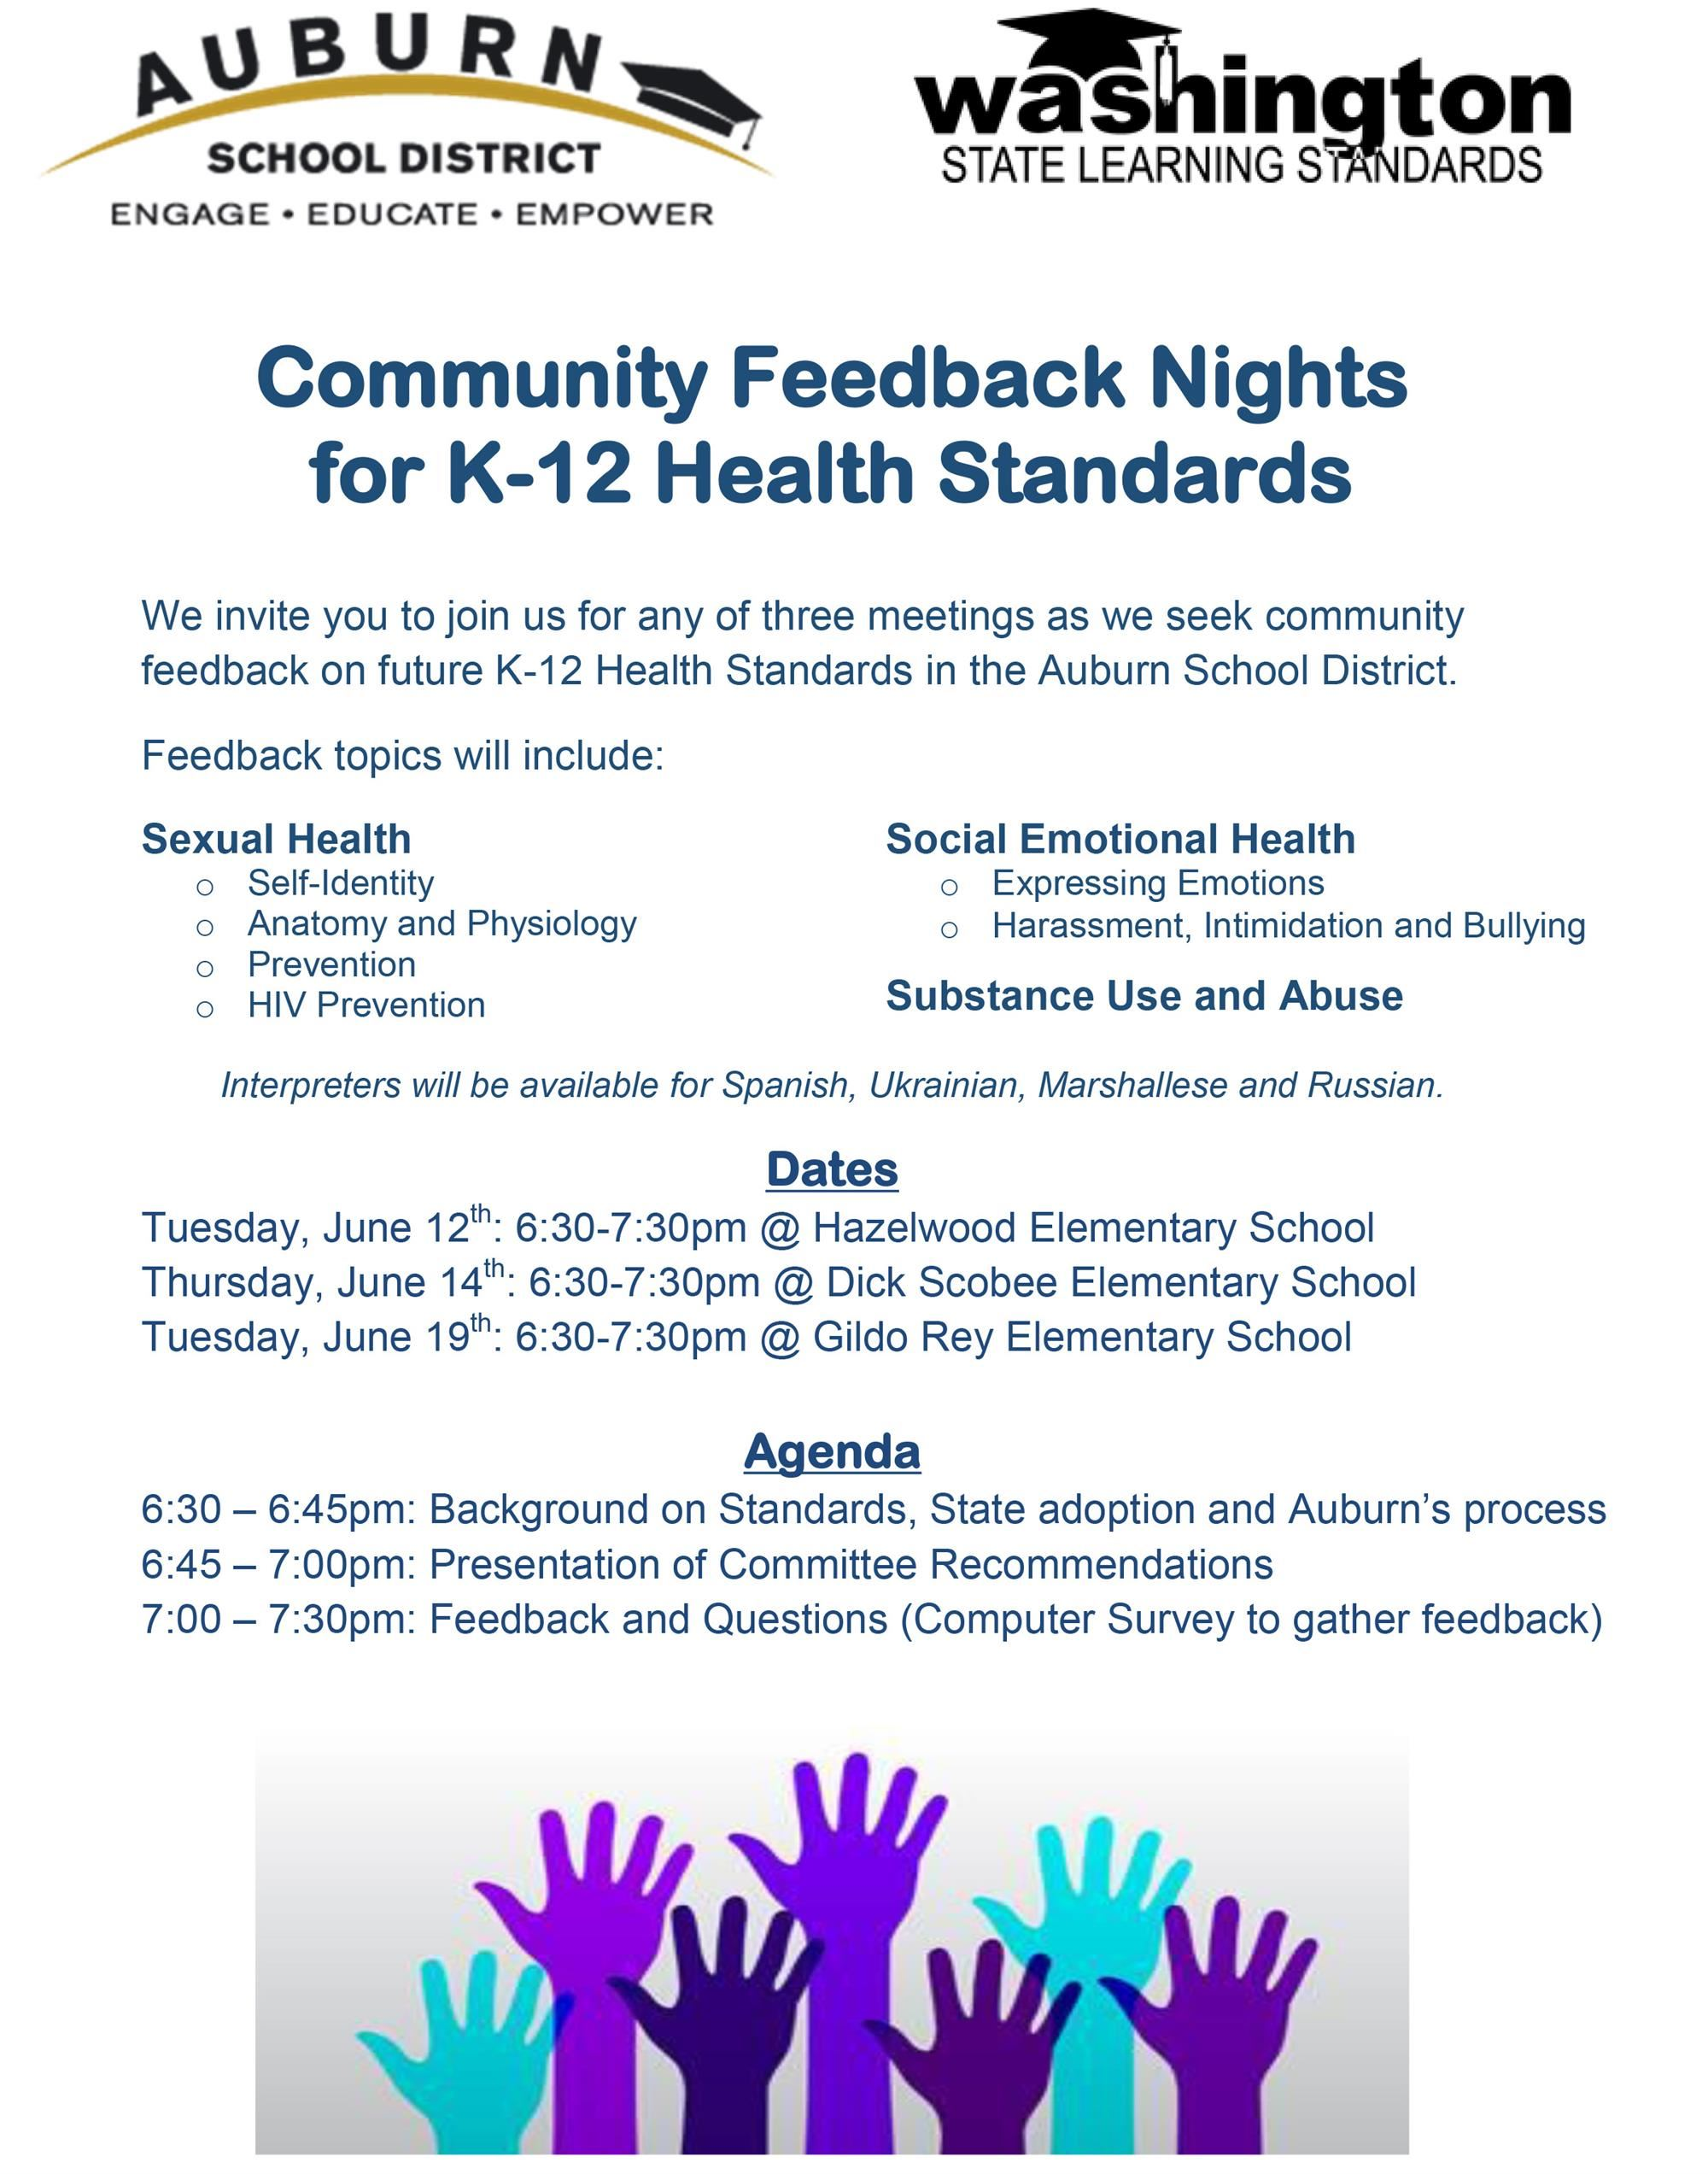 Community Feedback Night for K-12 Health Standards - Meeting @ Dick ...